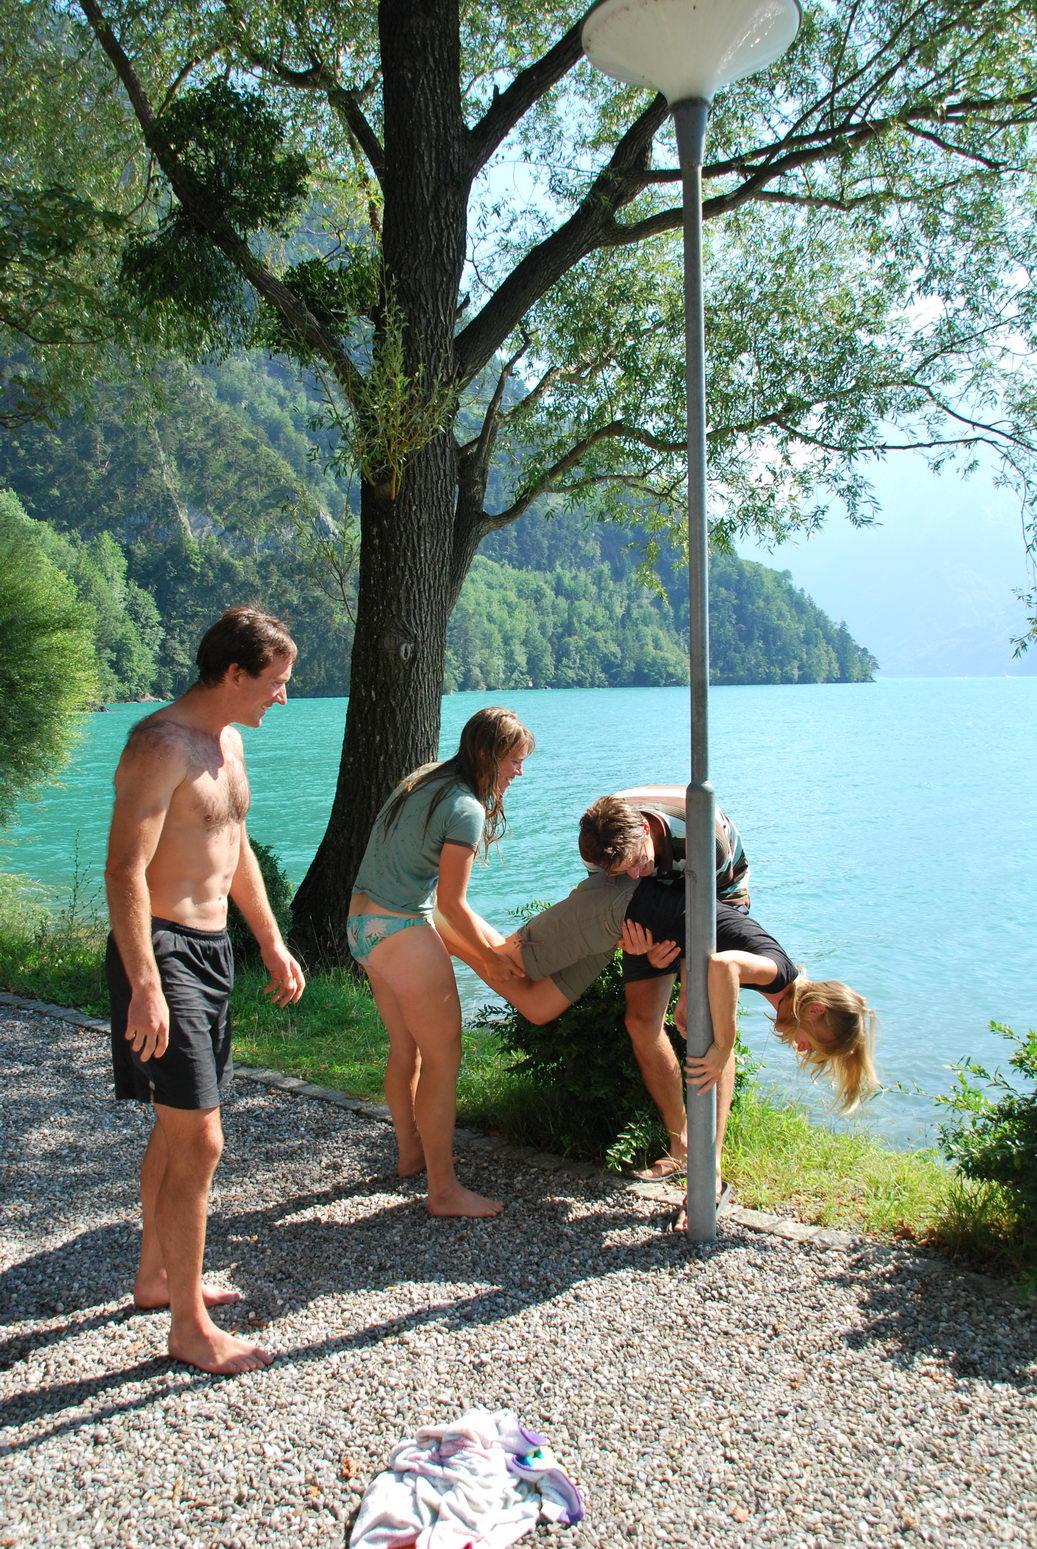 pole-dancing-with-abbie-3-swiss-o-week-switzerland